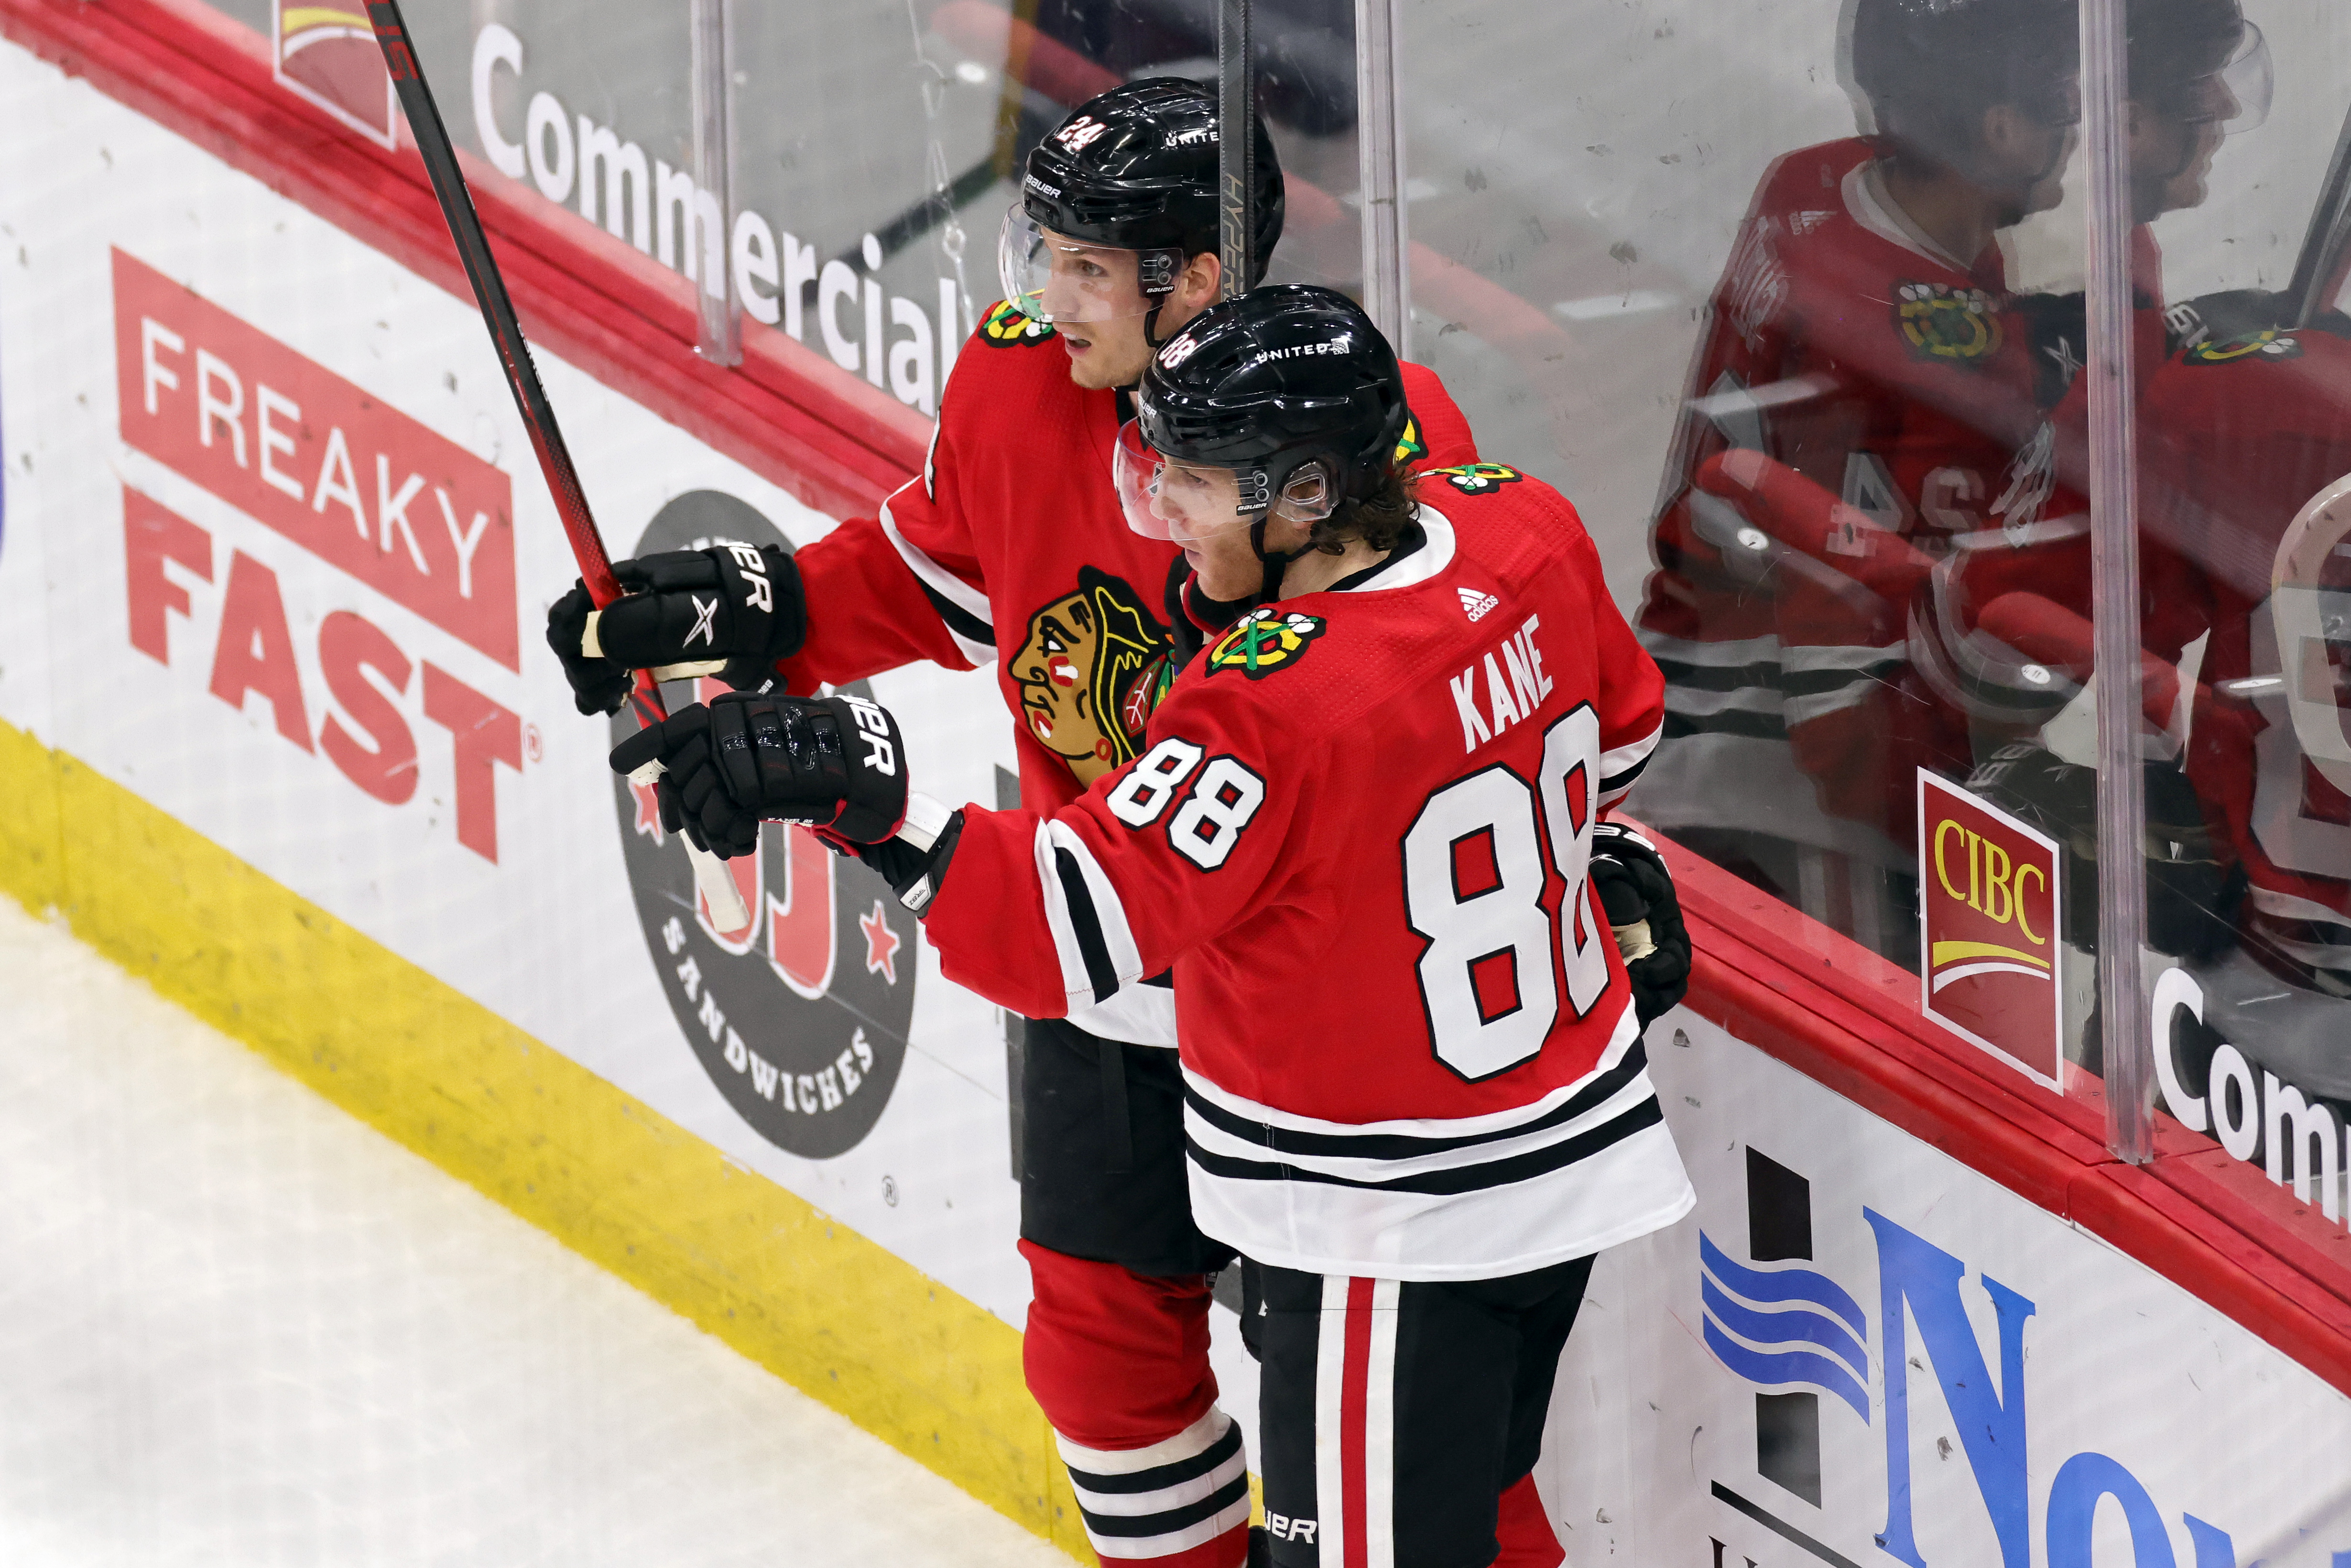 NHL: MAR 27 Predators at Blackhawks